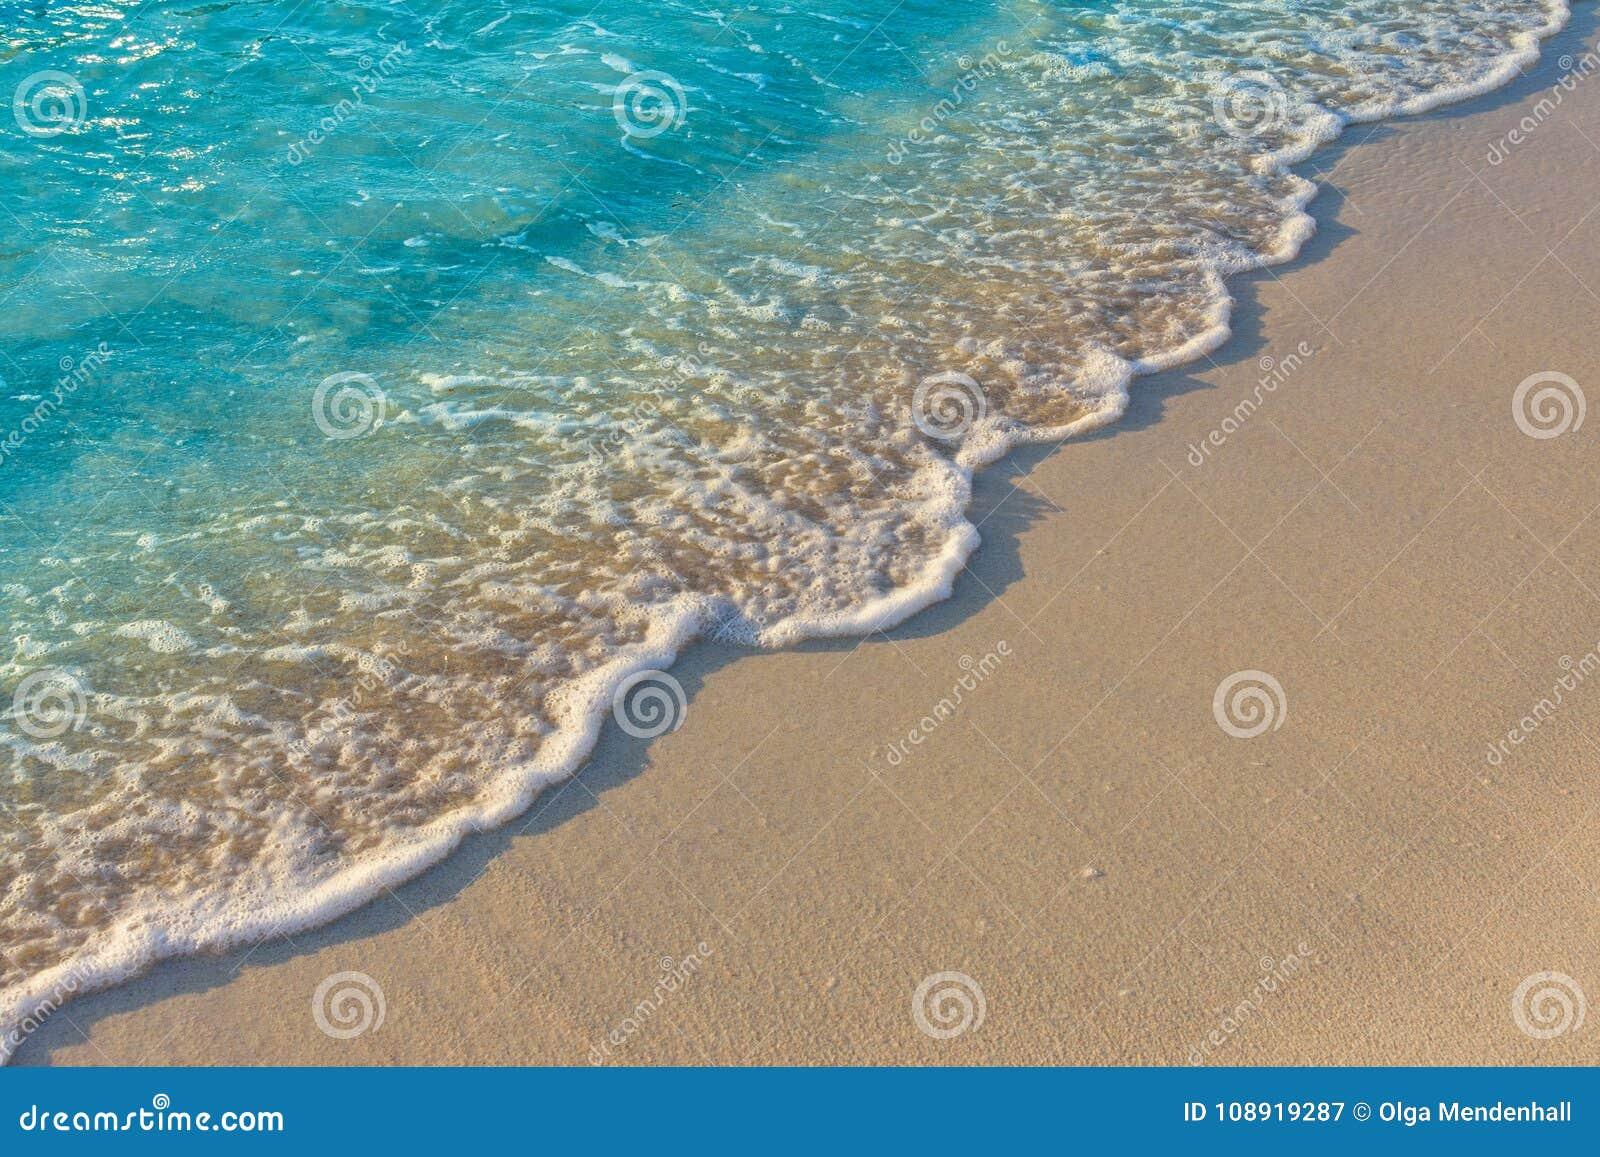 Turkooise blauwe oceaangolf op zandig strand Achtergrond, Textuur